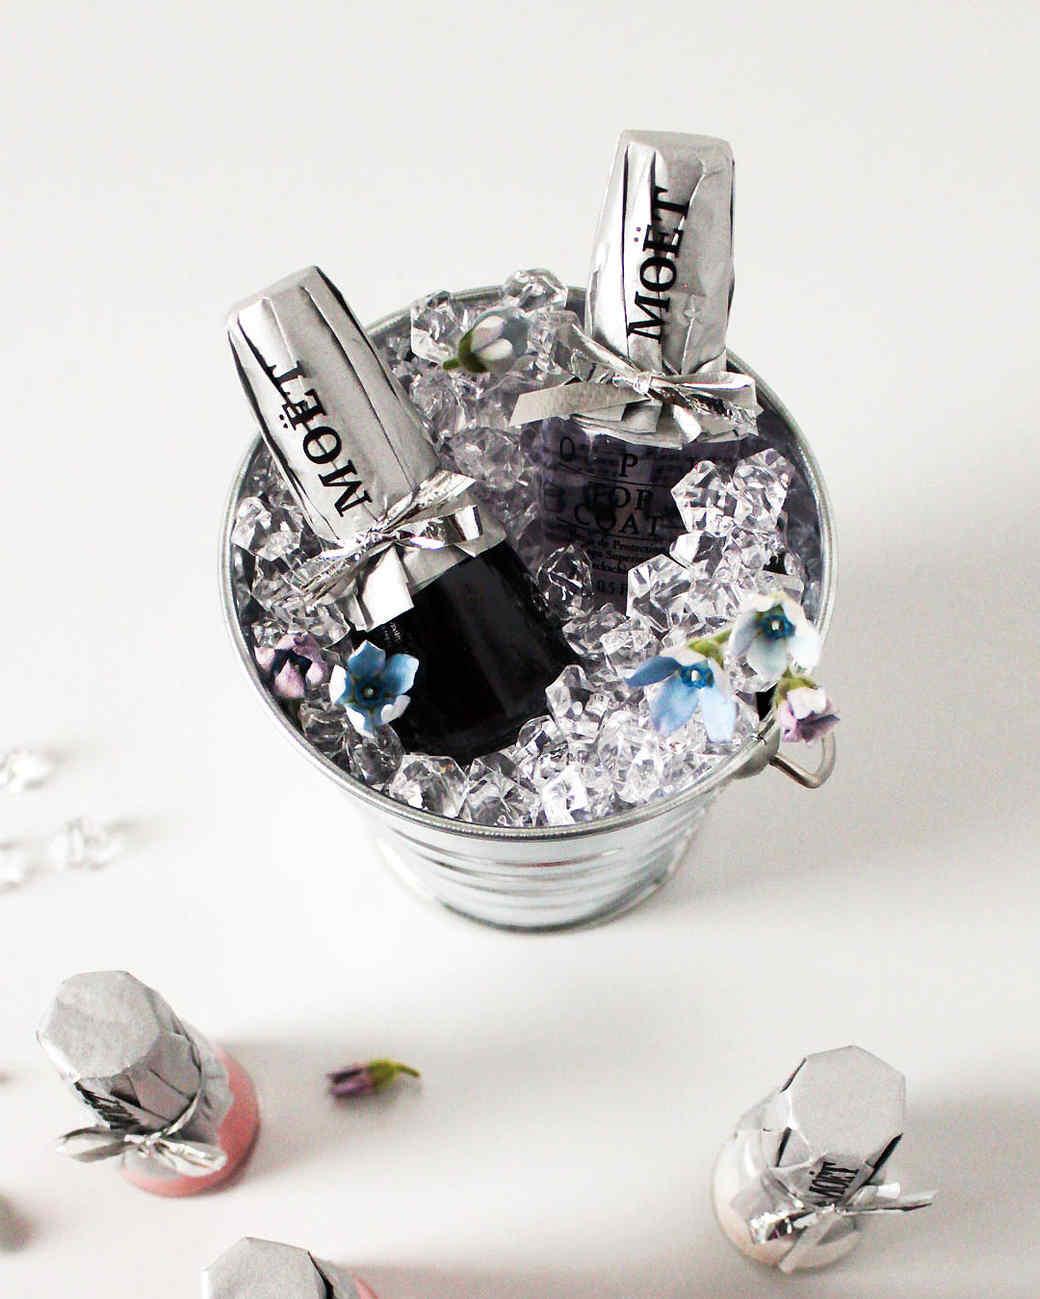 nail polish bottle bubbly party favors bucket